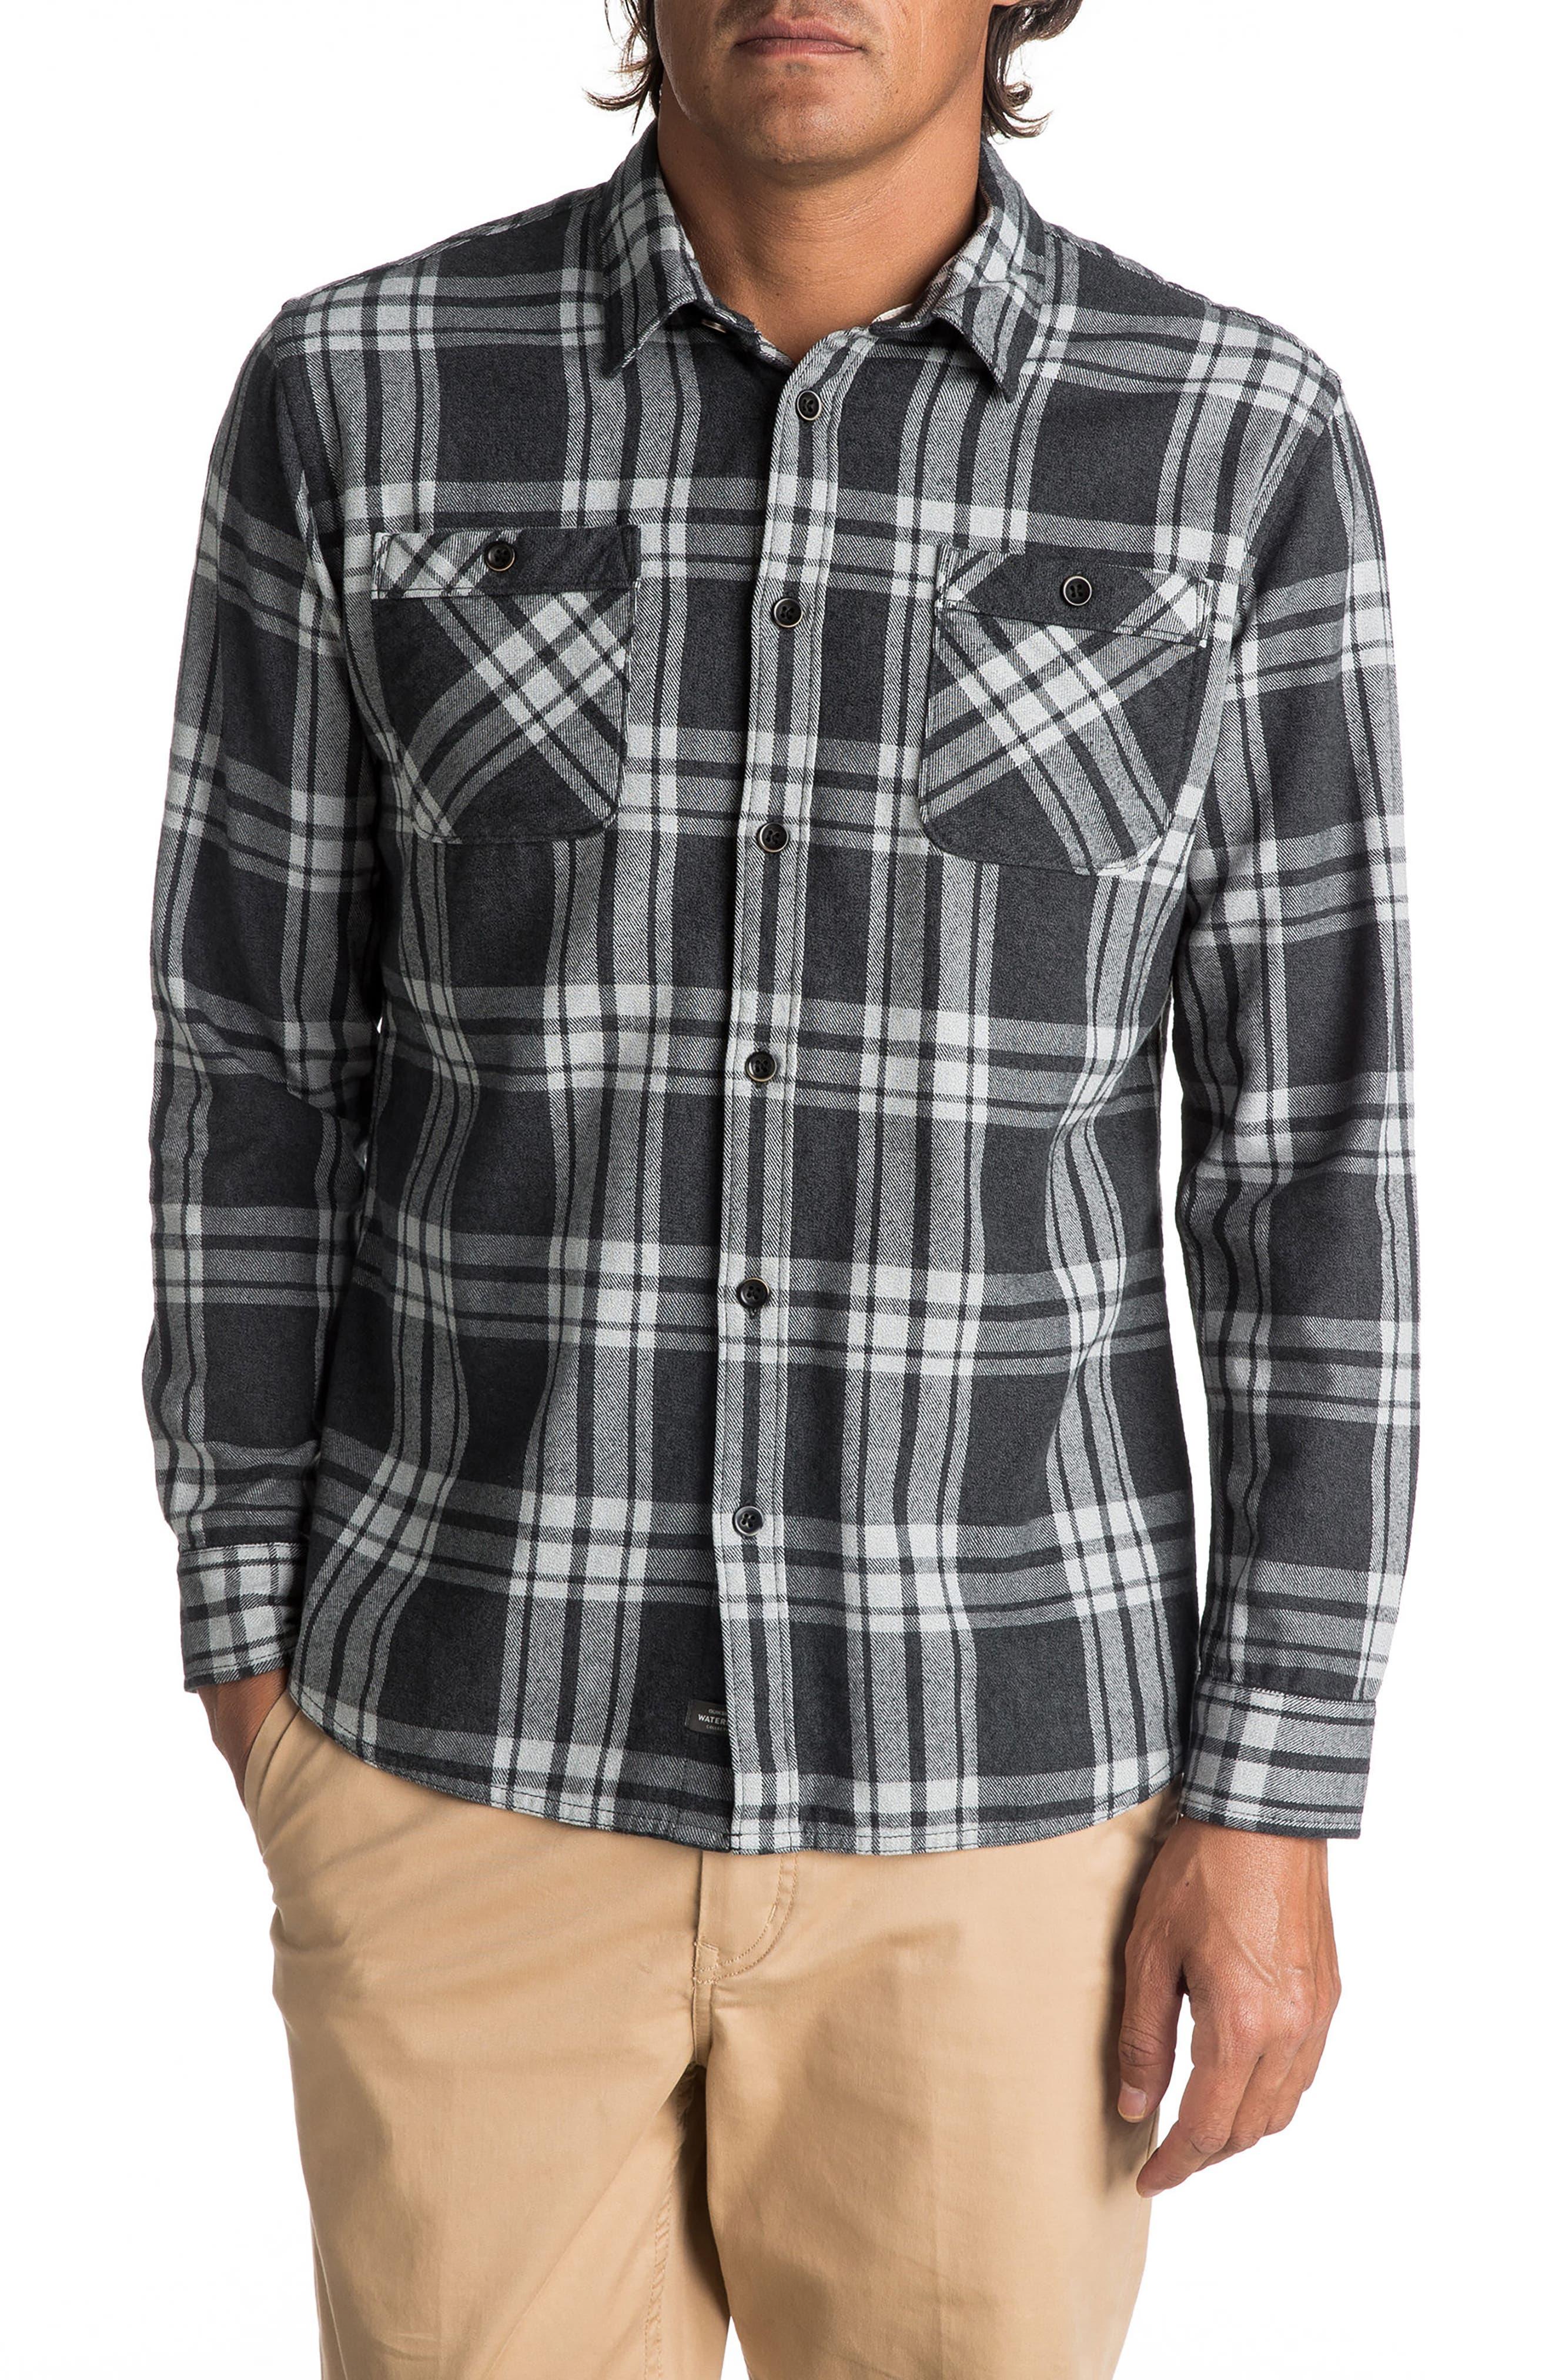 Moon Tides Plaid Flannel Shirt,                             Main thumbnail 1, color,                             002